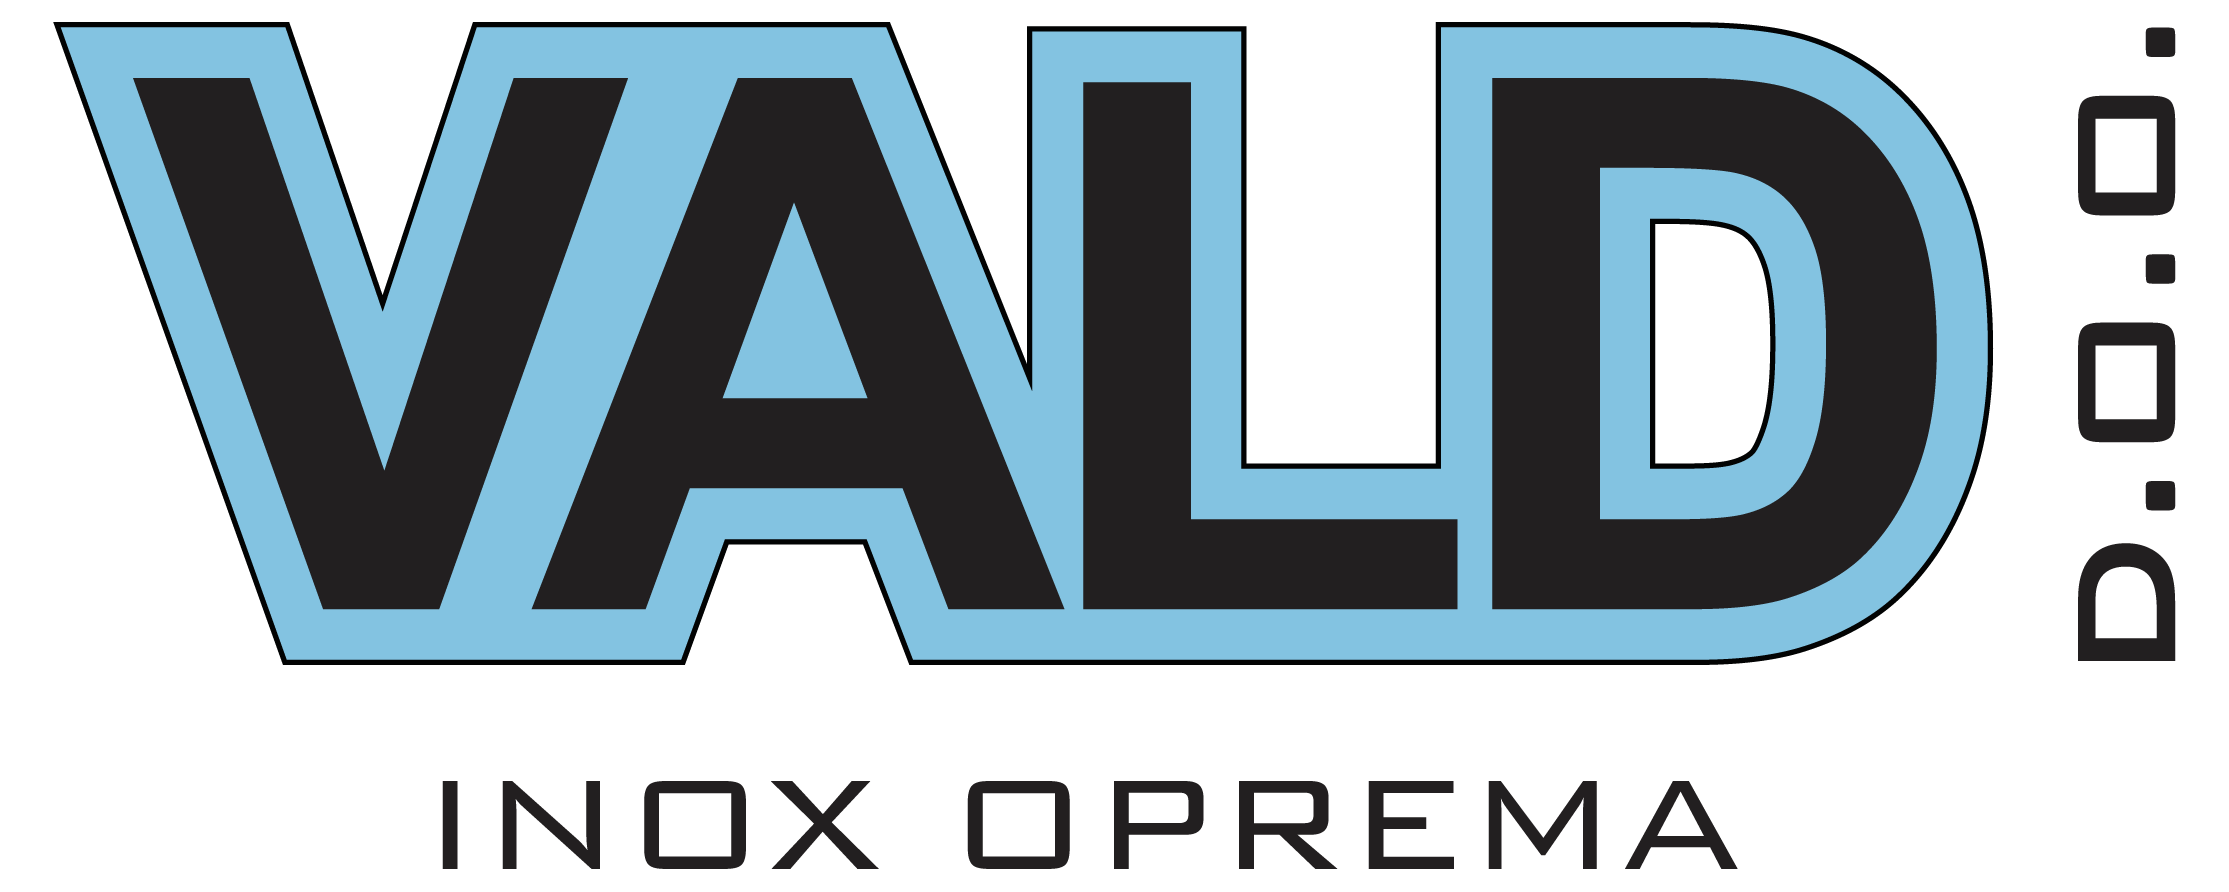 VALD – INOX OPREMA